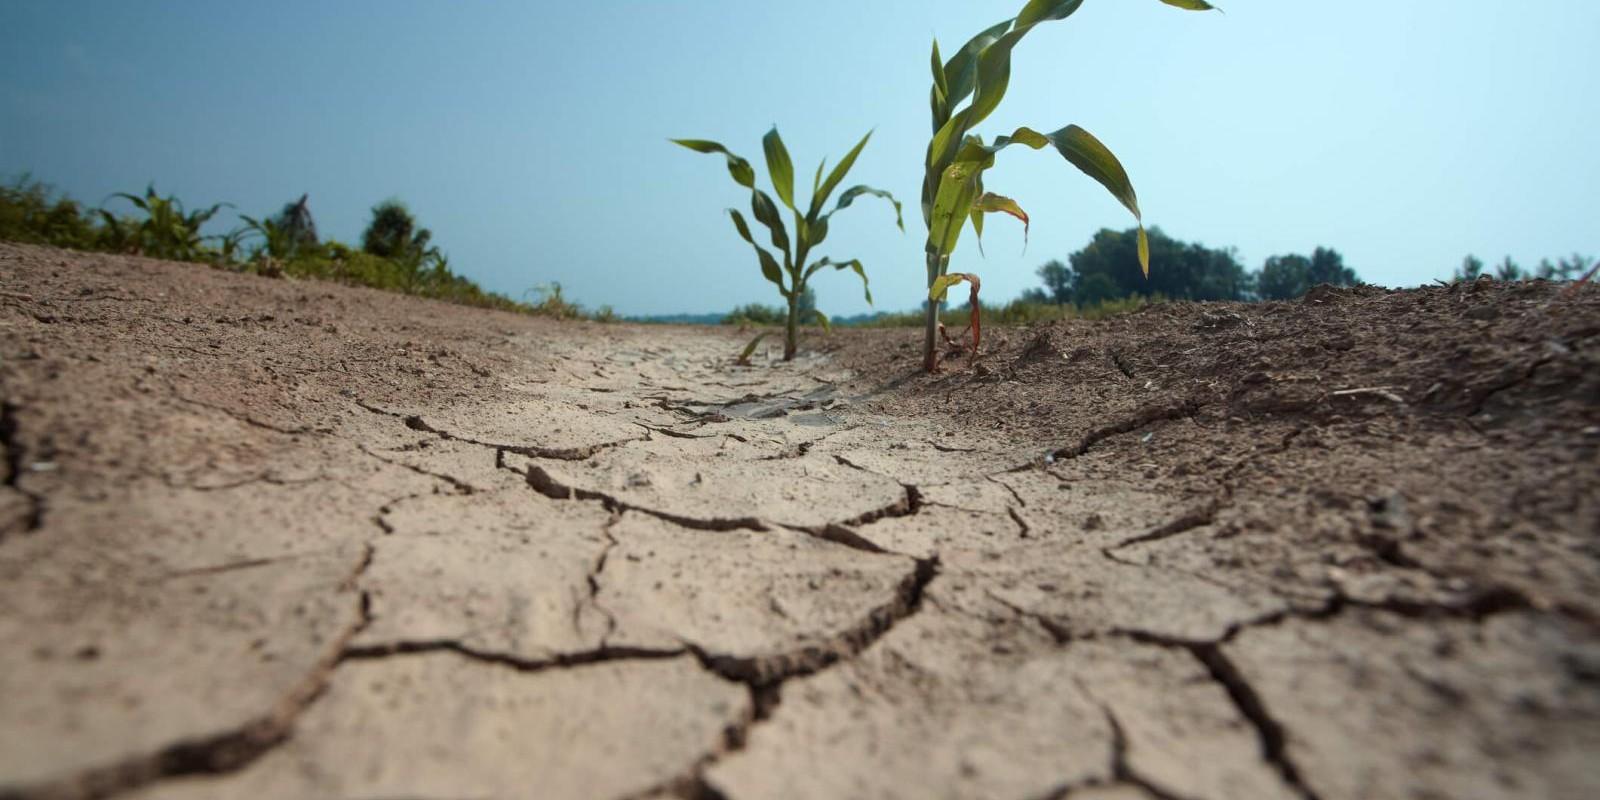 Crise de água no Brasil